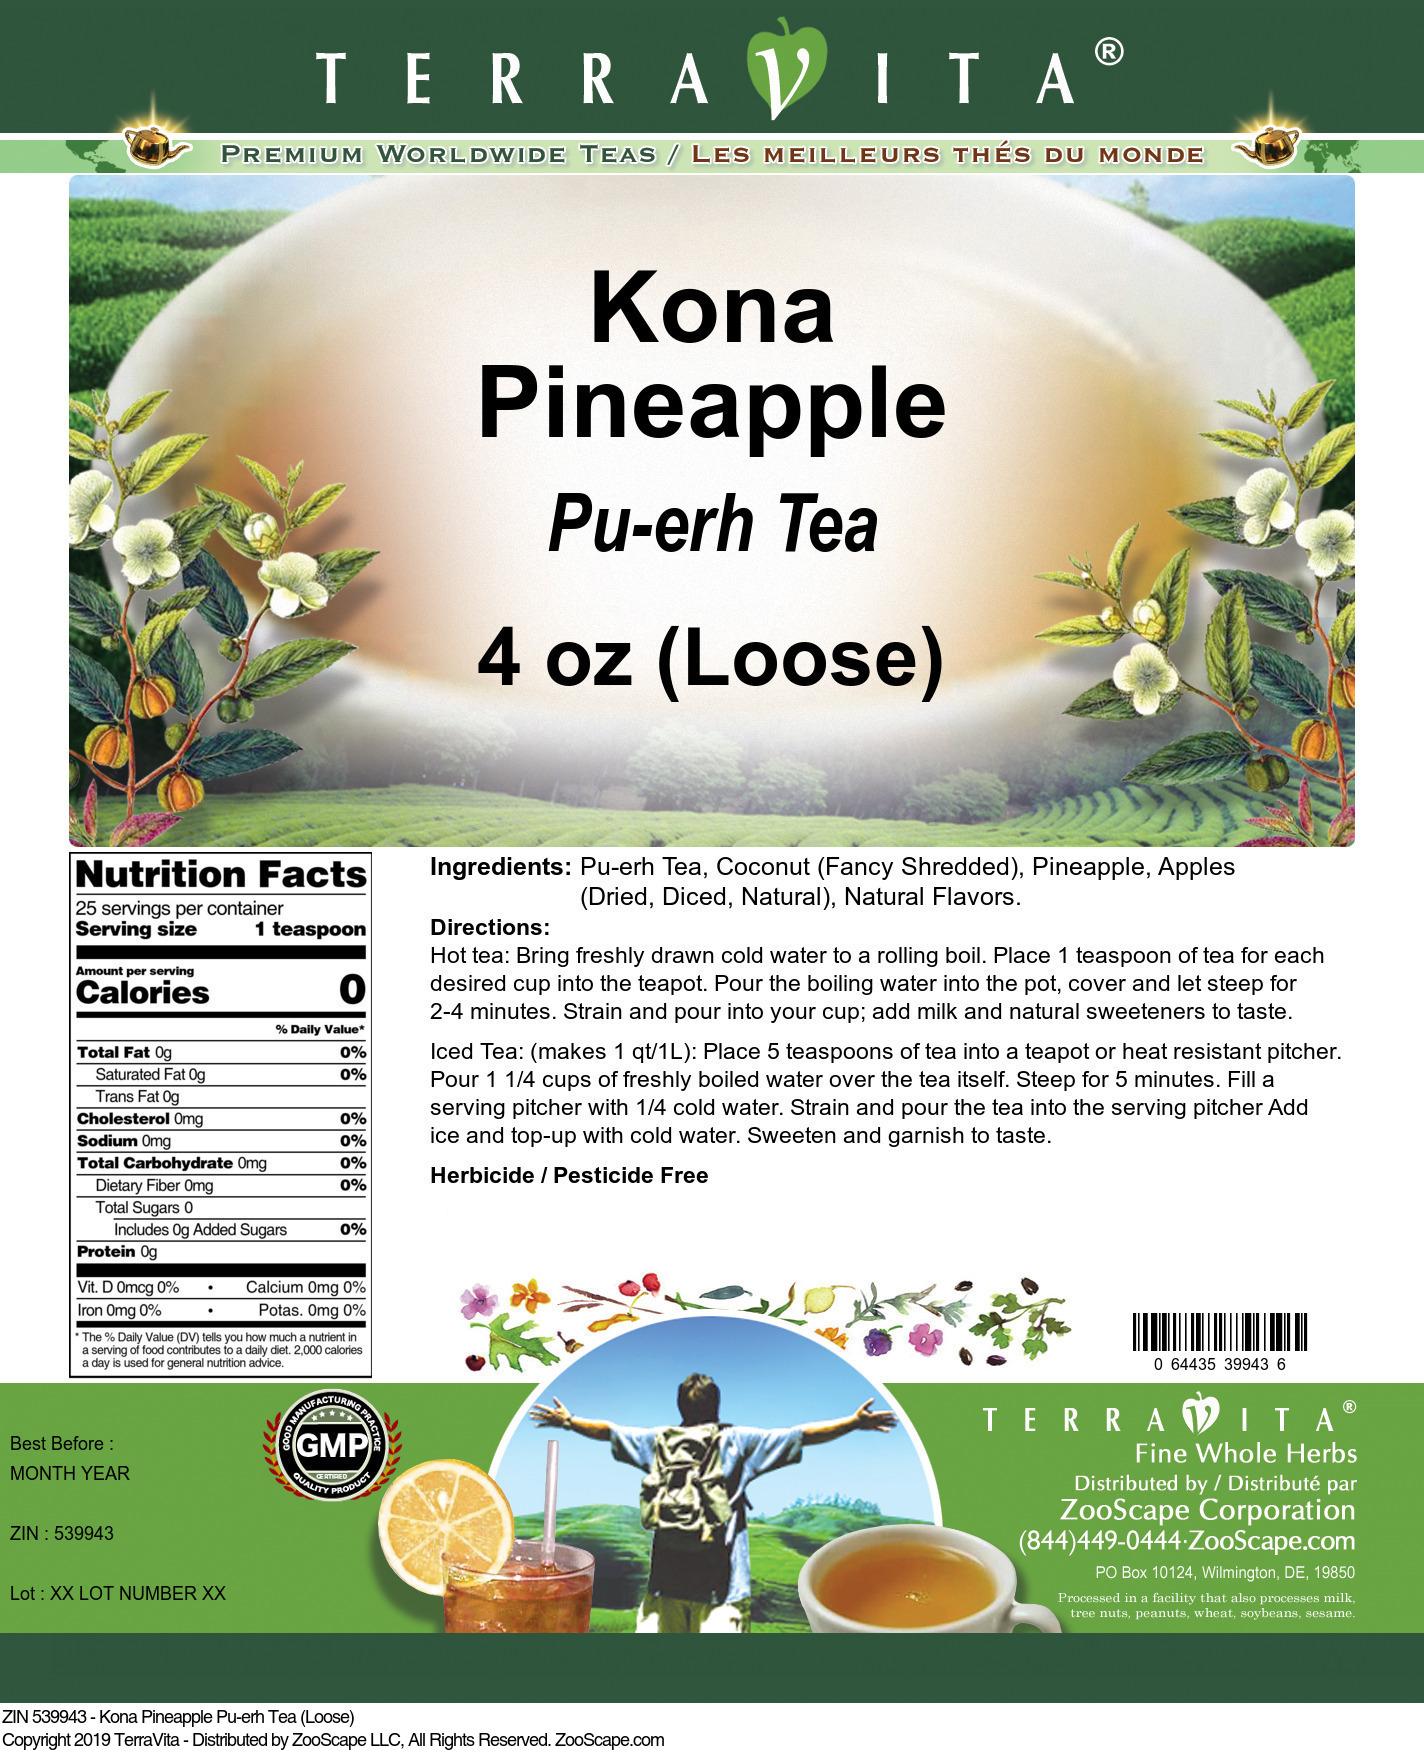 Kona Pineapple Pu-erh Tea